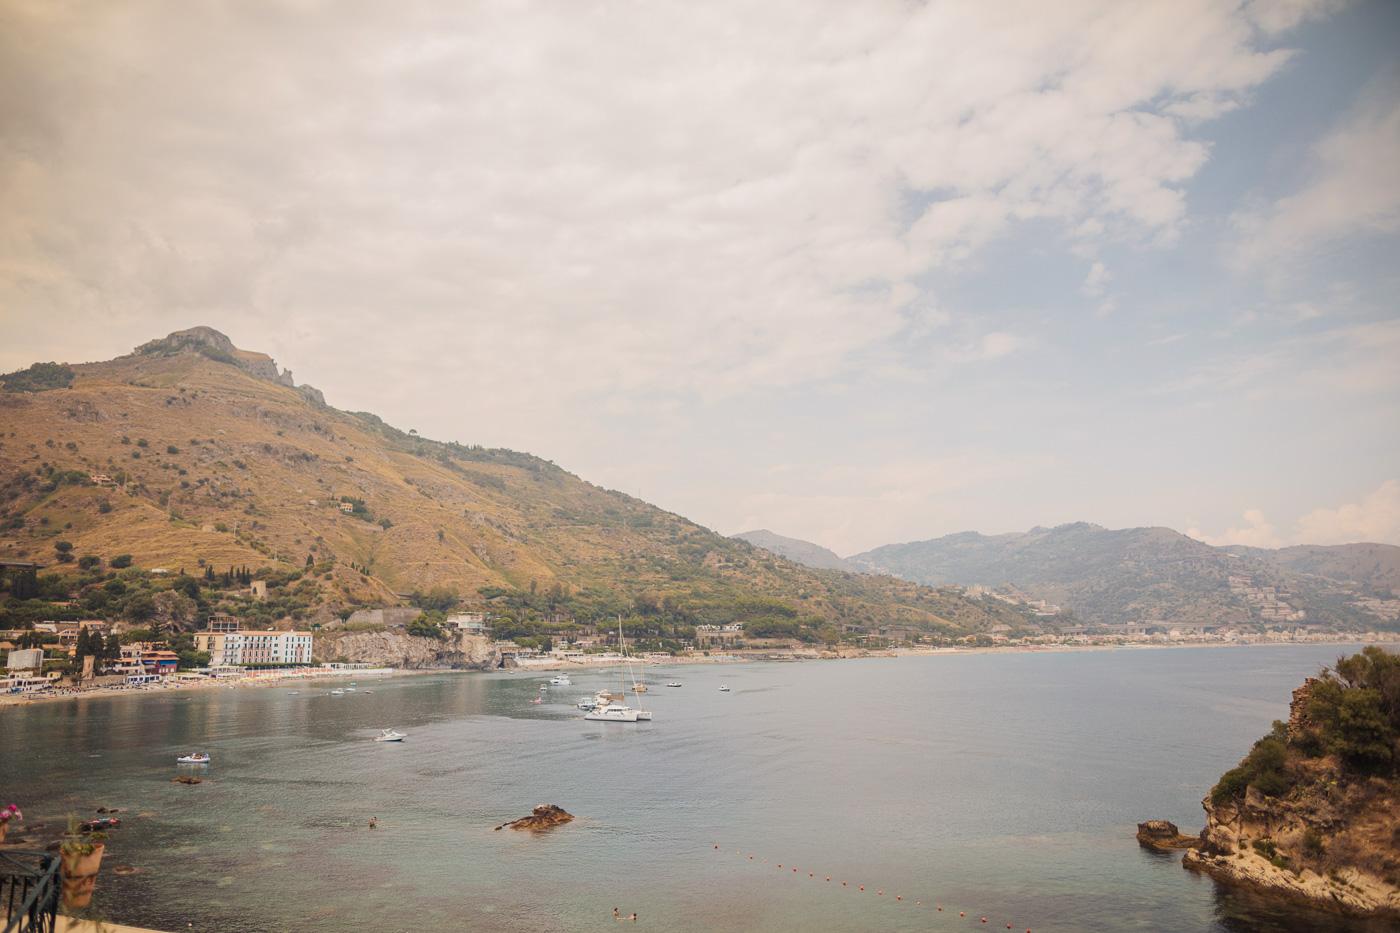 Wedding Atlantis Bay _taormina_venue_sea_luxury_photographer_top_videographer_videography_beach_hotel_marco_ficili_001-